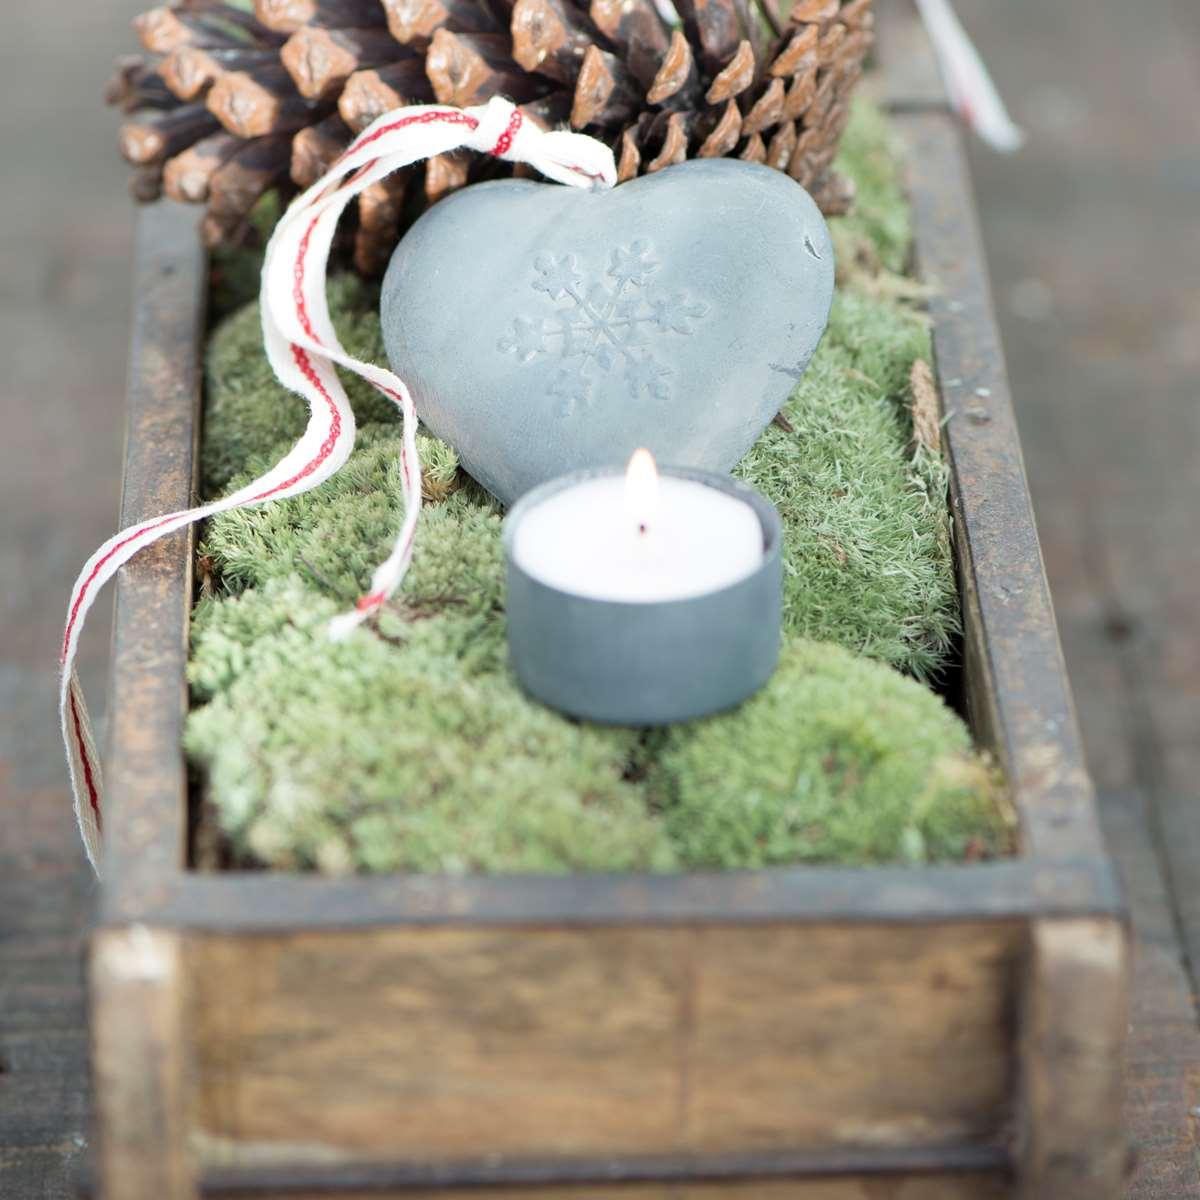 Hjärta med snöflinga zink